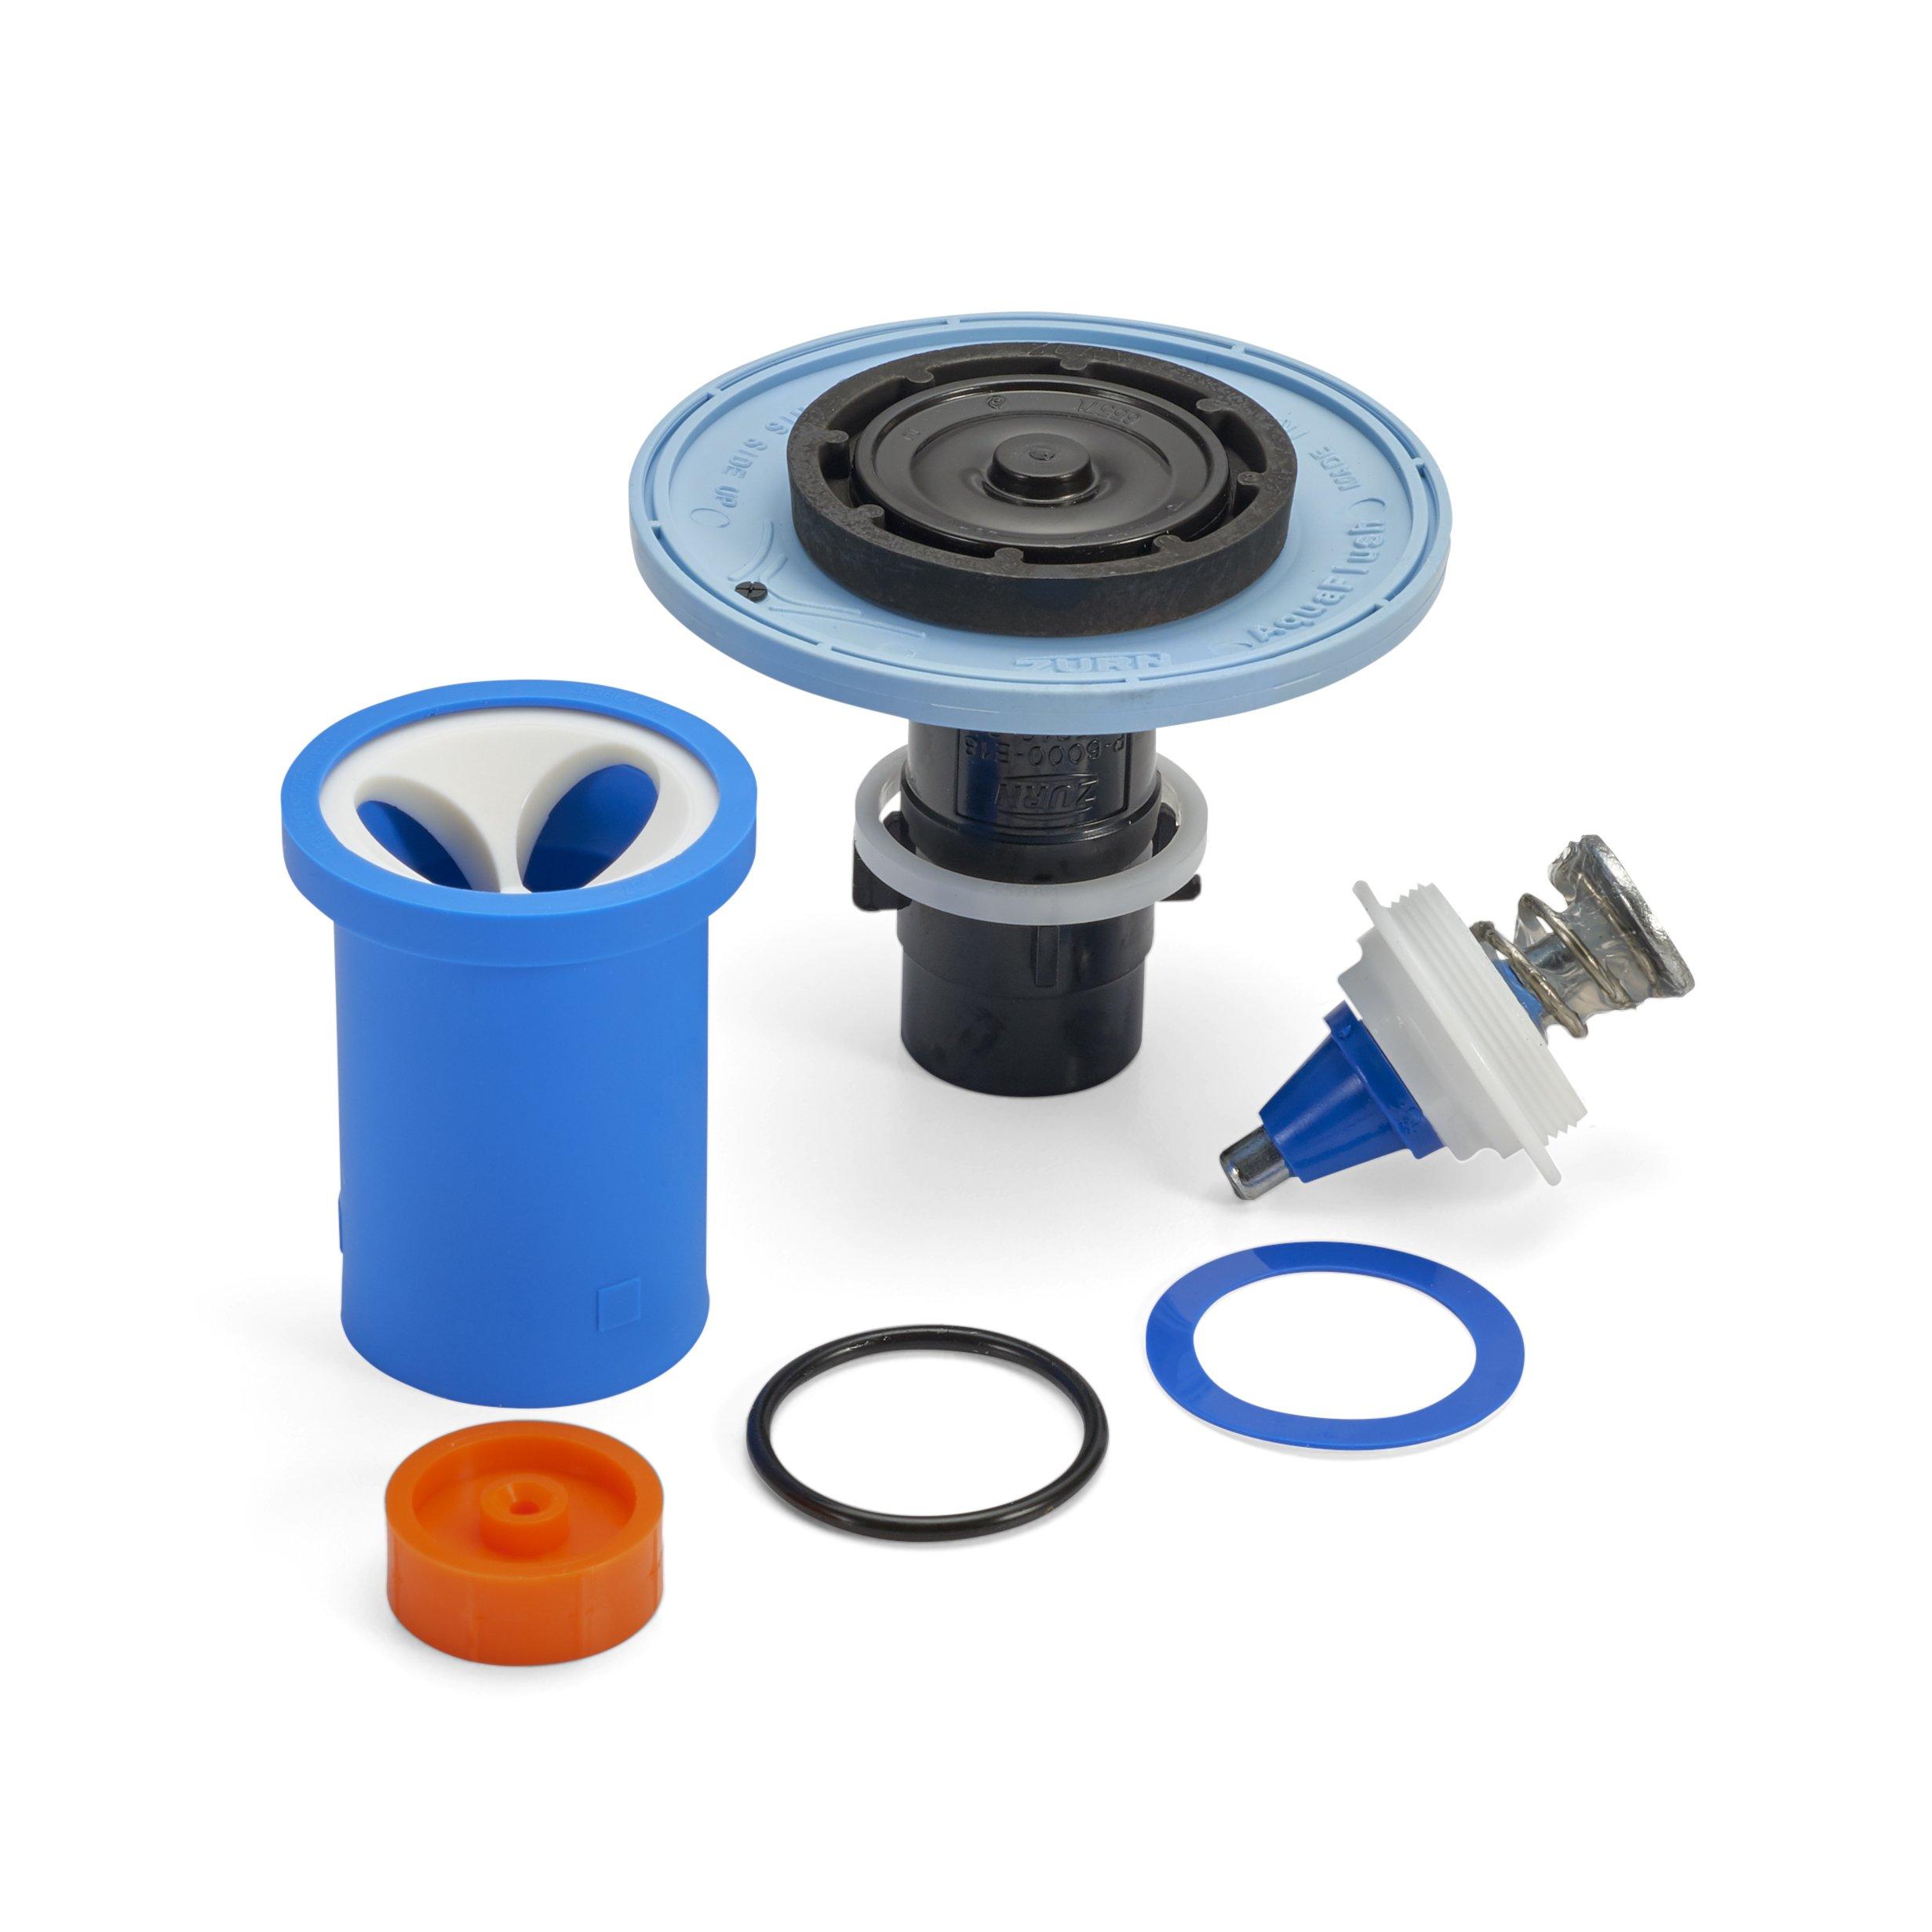 Zurn AquaVantage Urinal Rebuild Kit, P6000-EUA-ULF-RK.125 gpf, Diaphragm Rebuild Kit